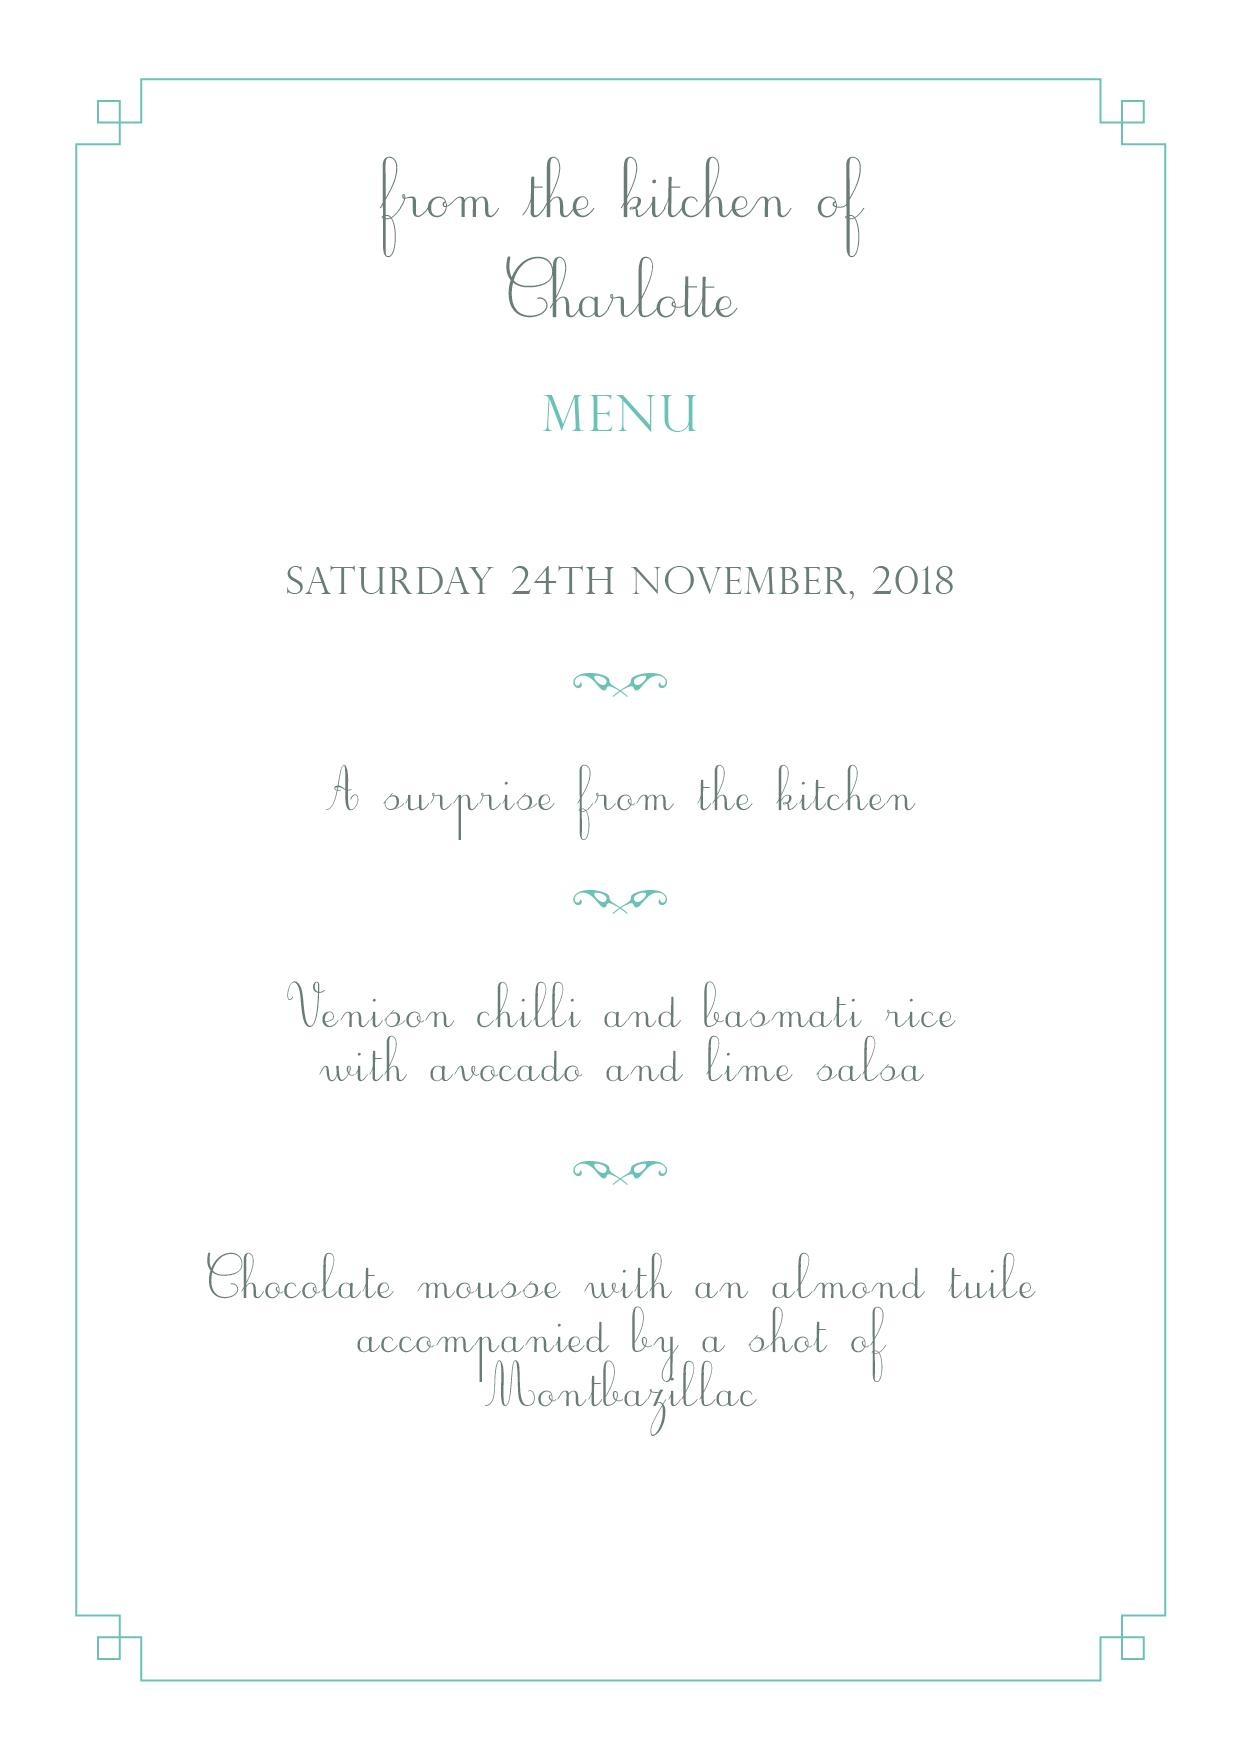 Charlotte's menus 24.11.18.jpg